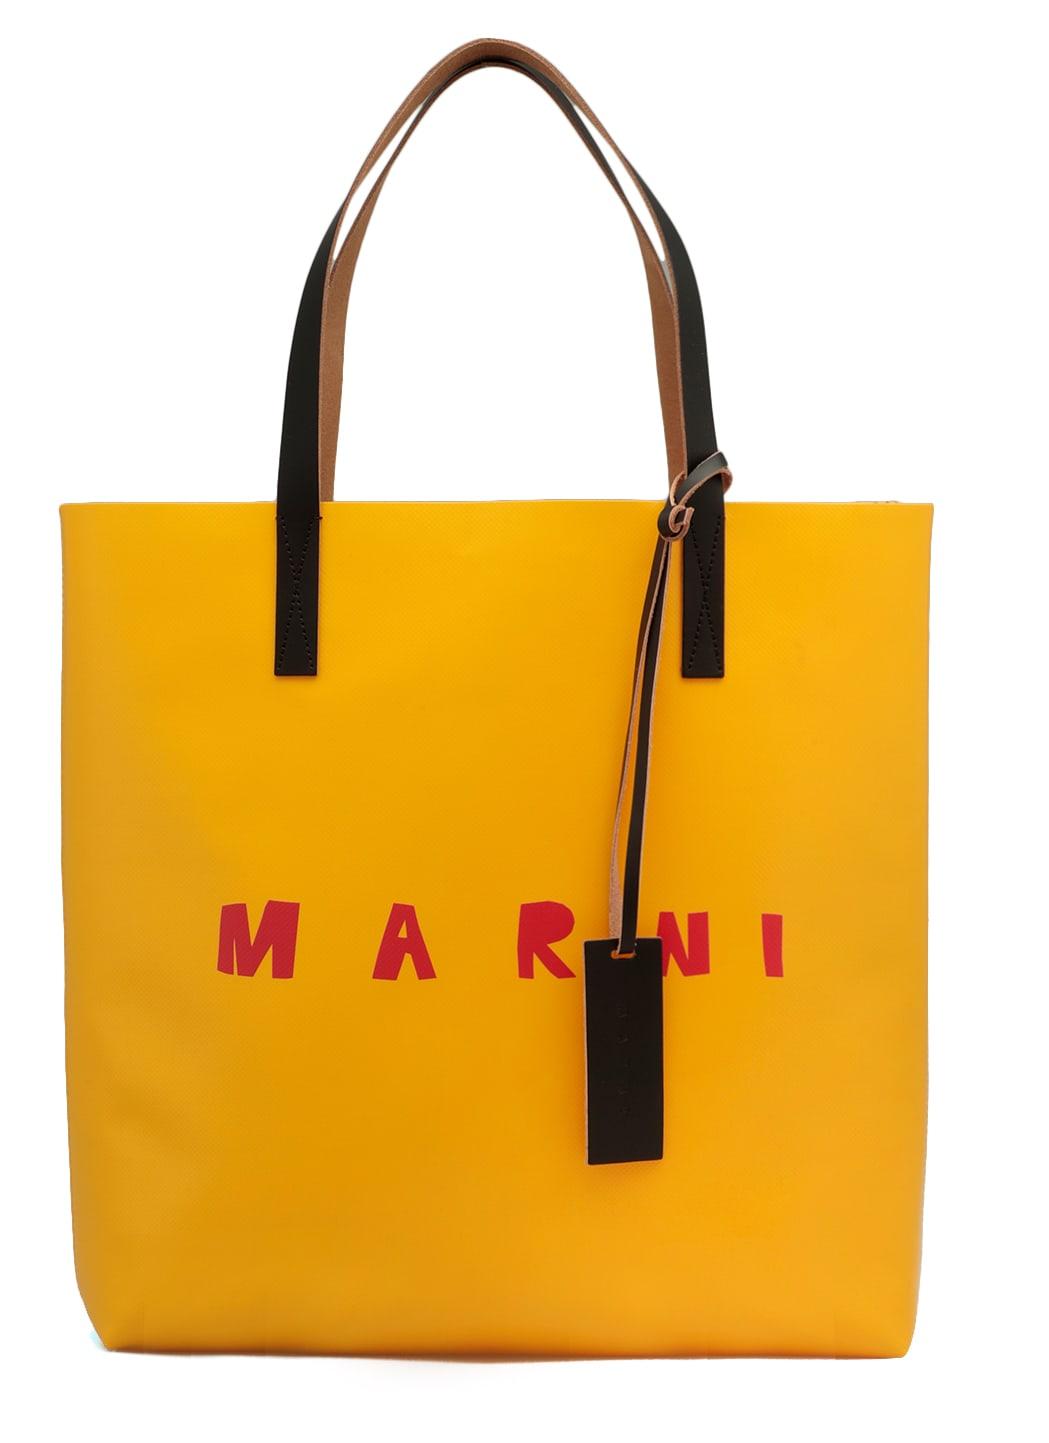 Marni Pvc Shopping Bag